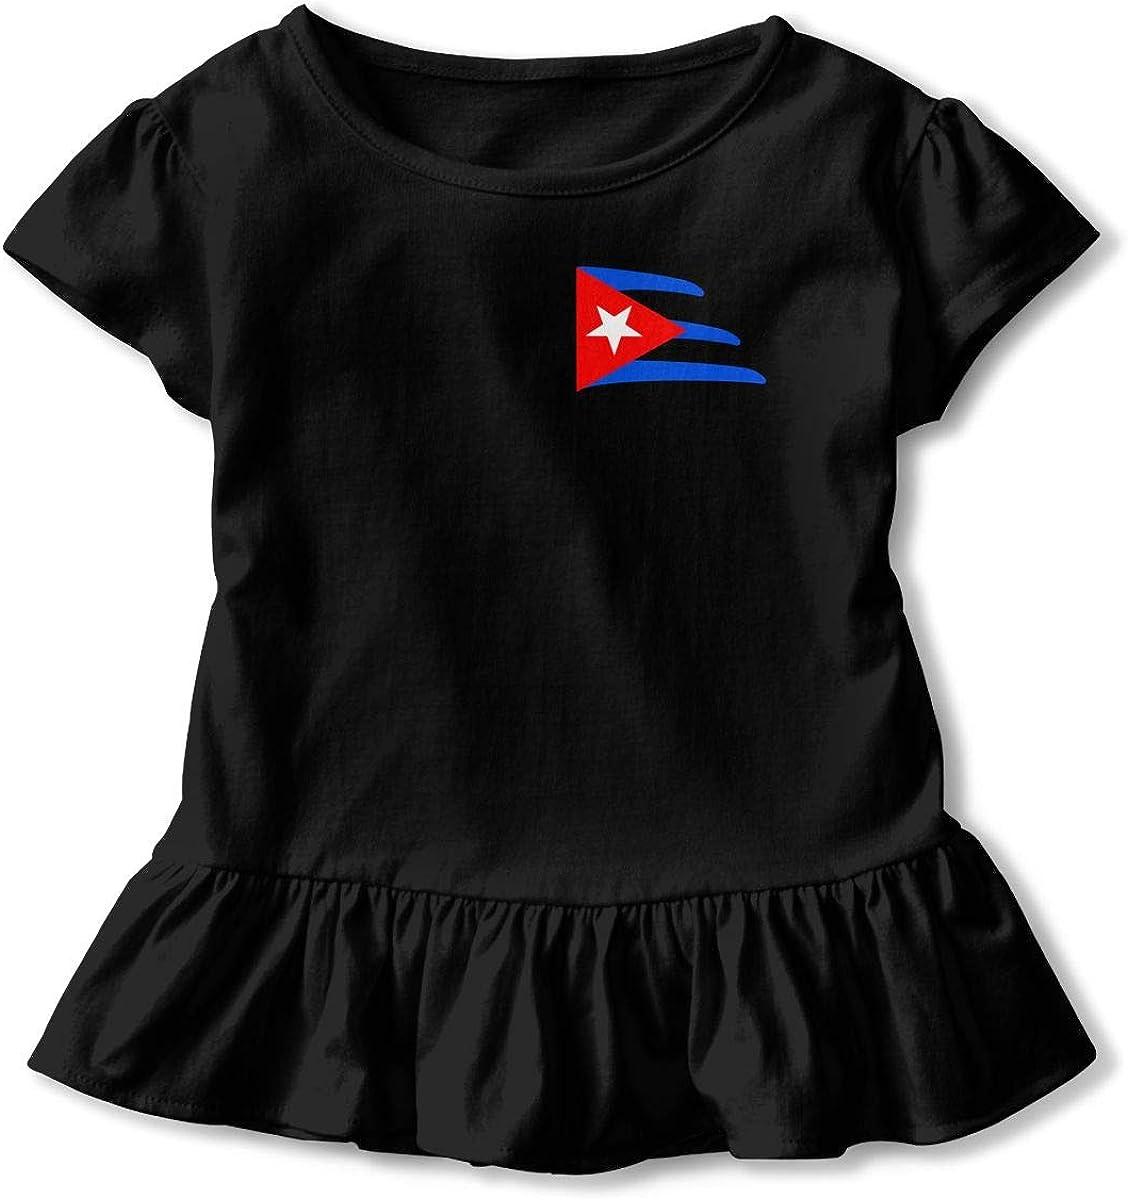 Toddler Baby Girl Cuba Icon 100/% Cotton T Shirts Short Sleeve Ruffle Tee Basic Tops